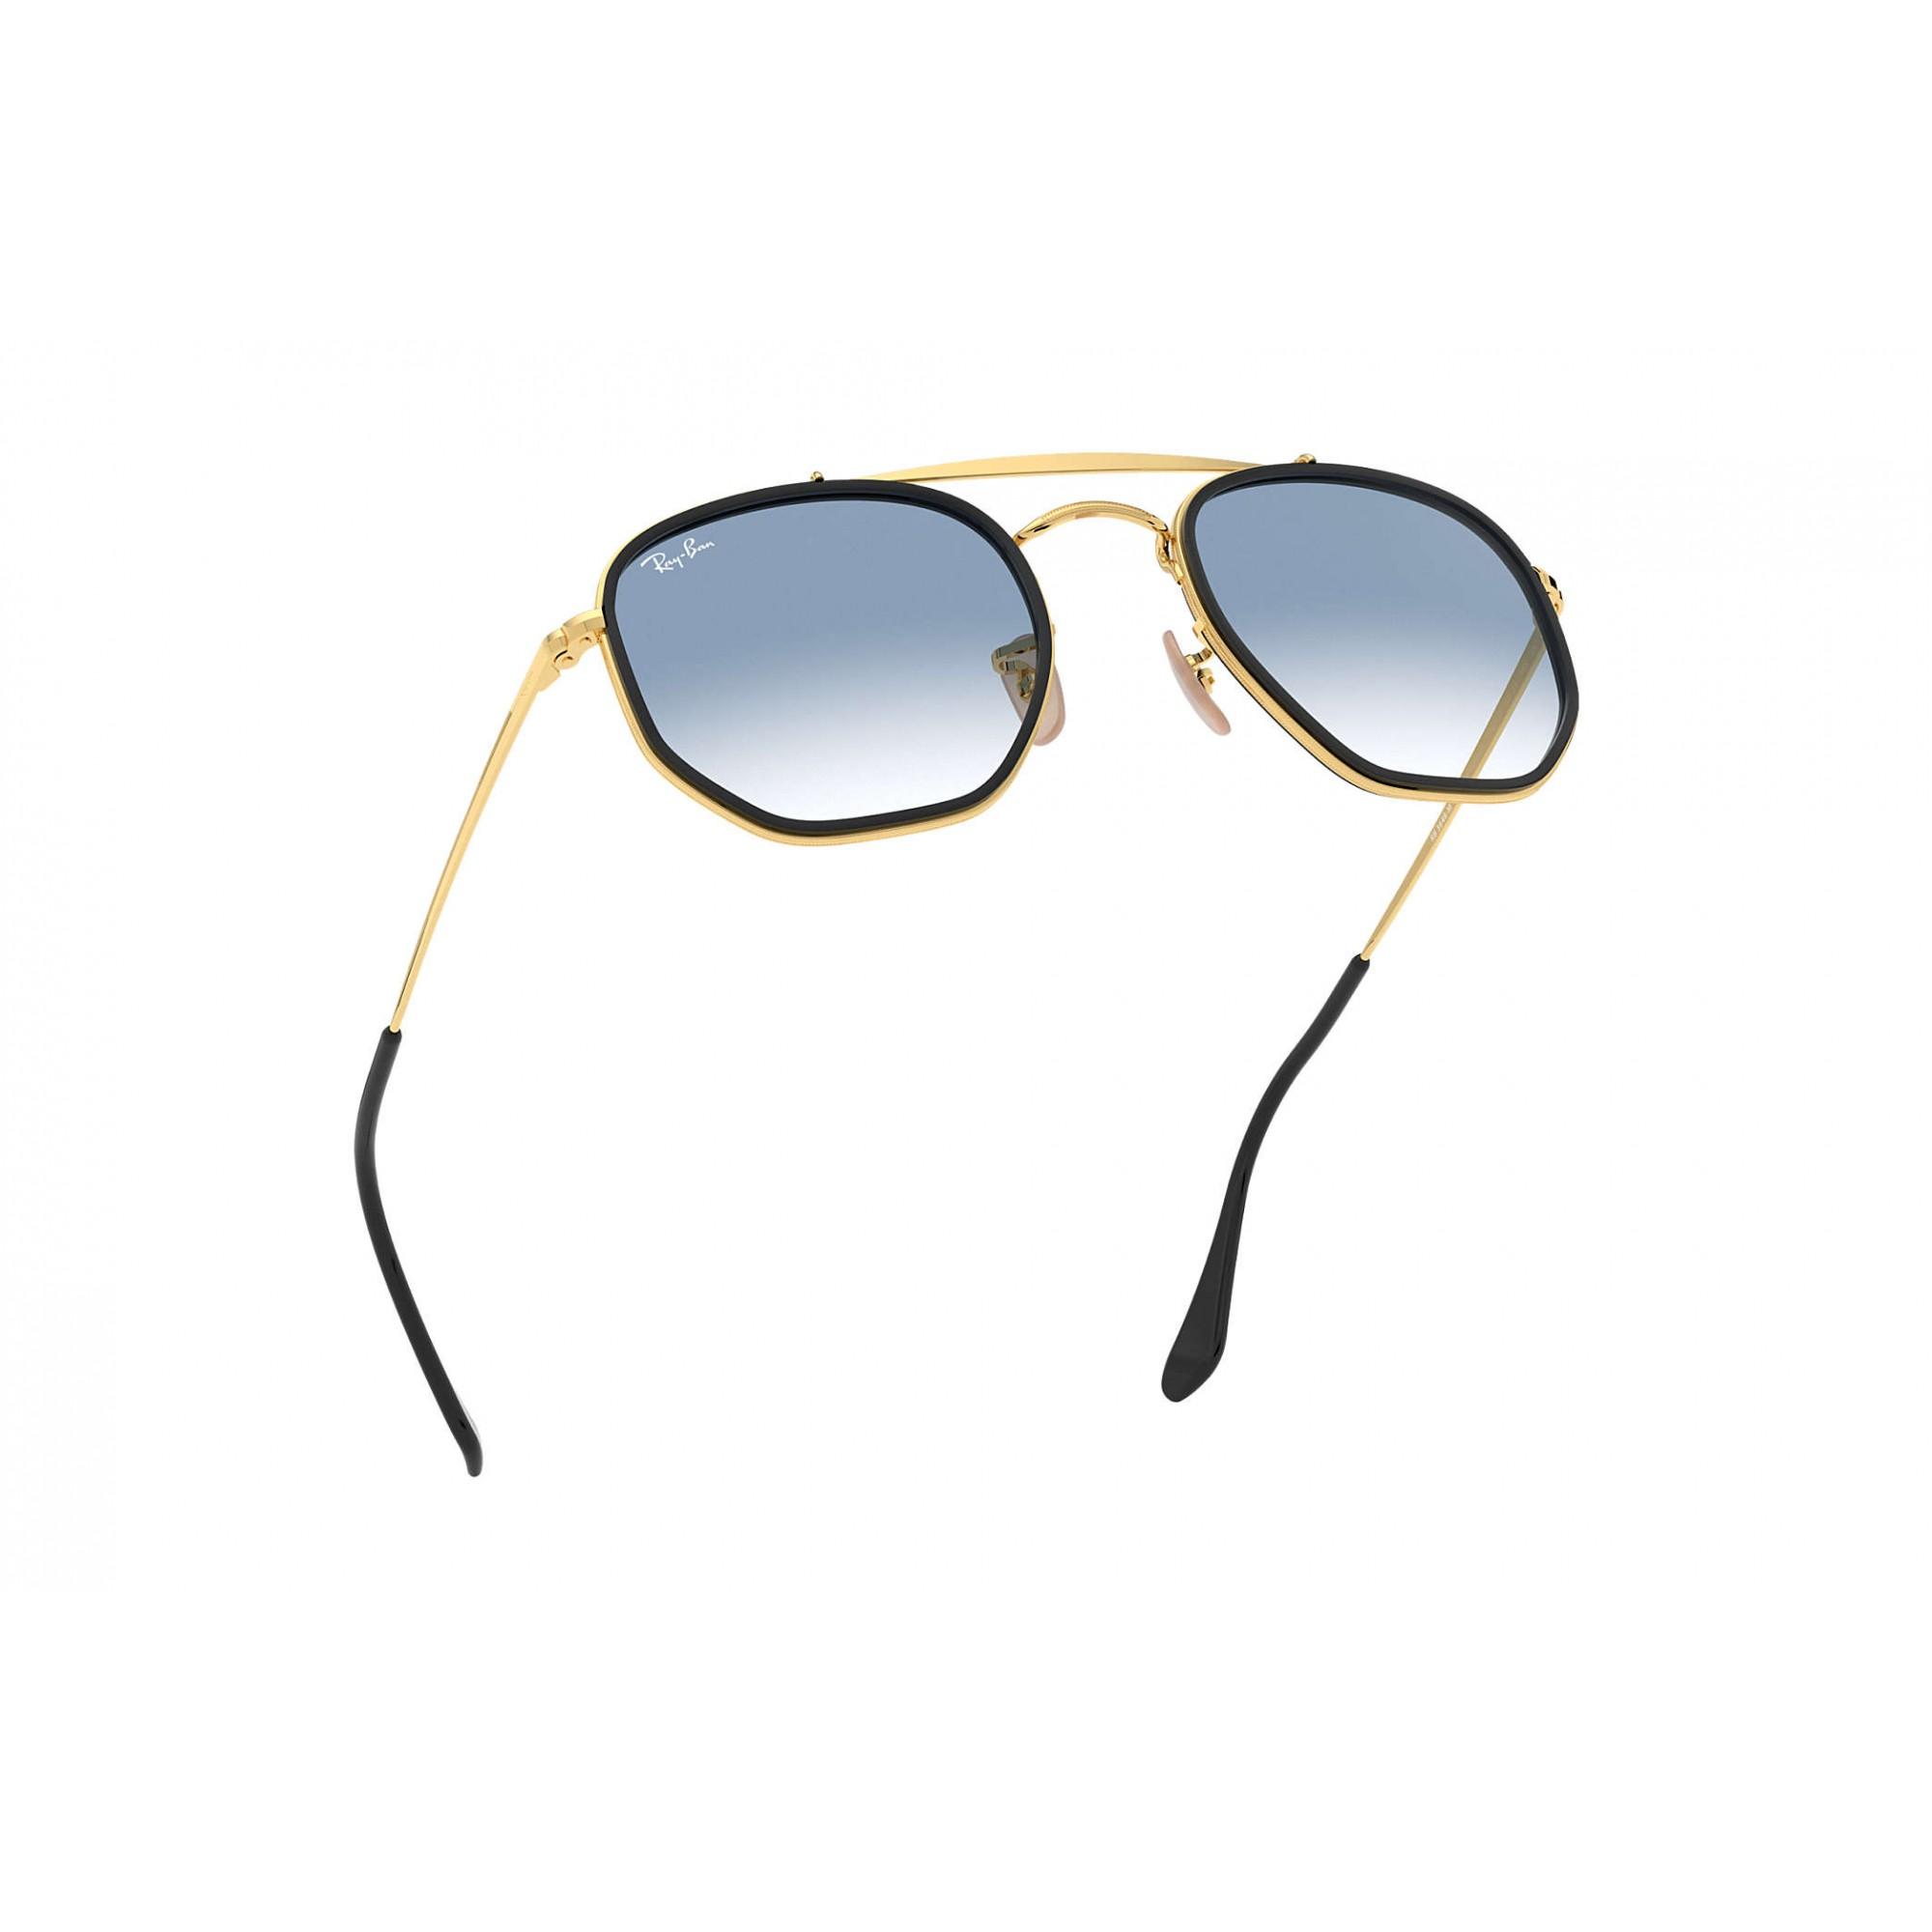 Ray Ban - RB3648M 91673F 52 - Óculos de sol